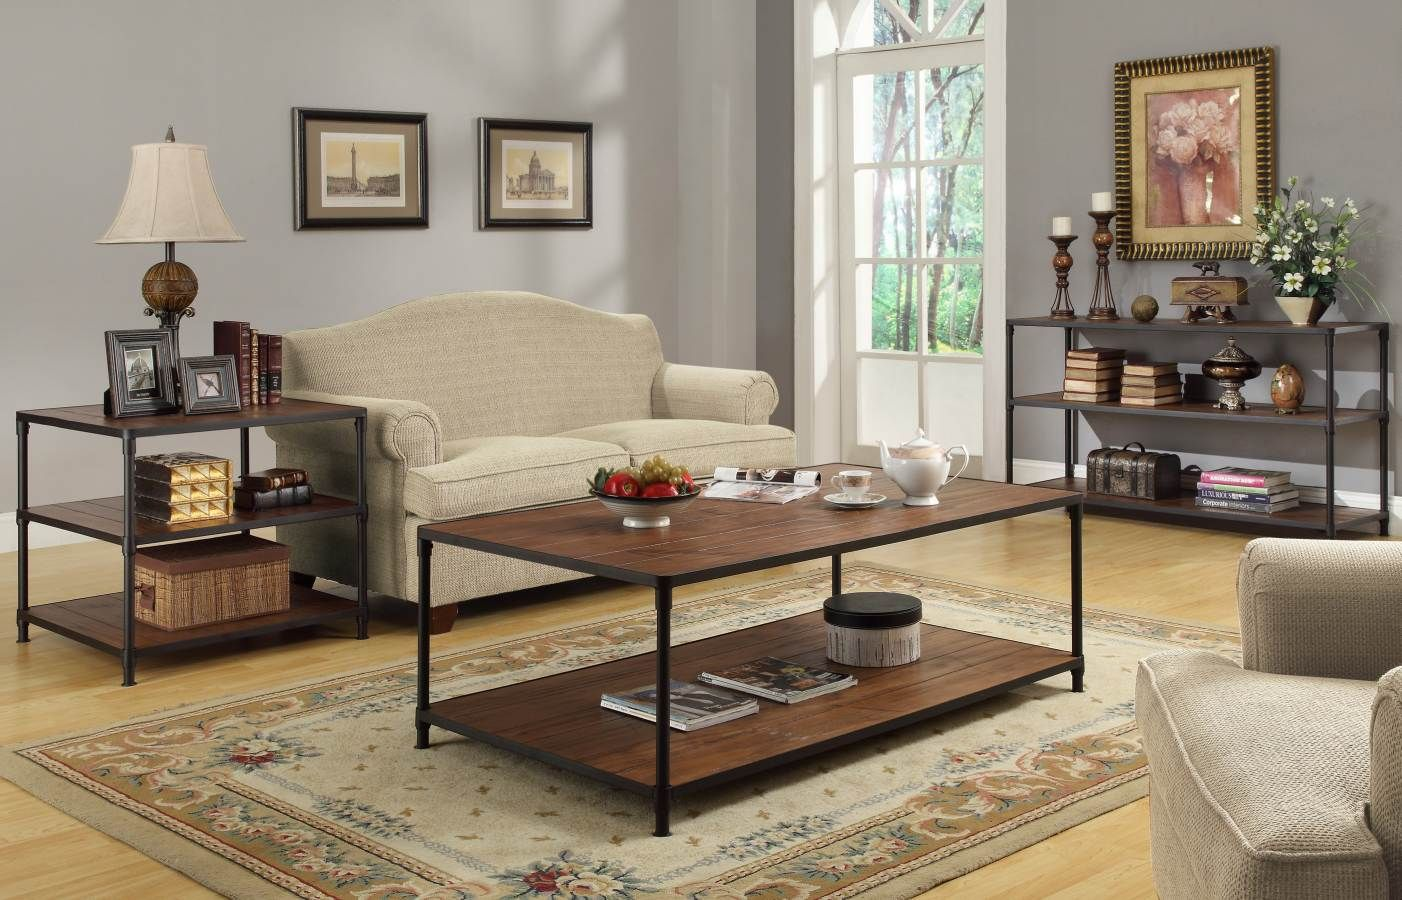 Mikah burnish oak end table home elegance pinterest metals and